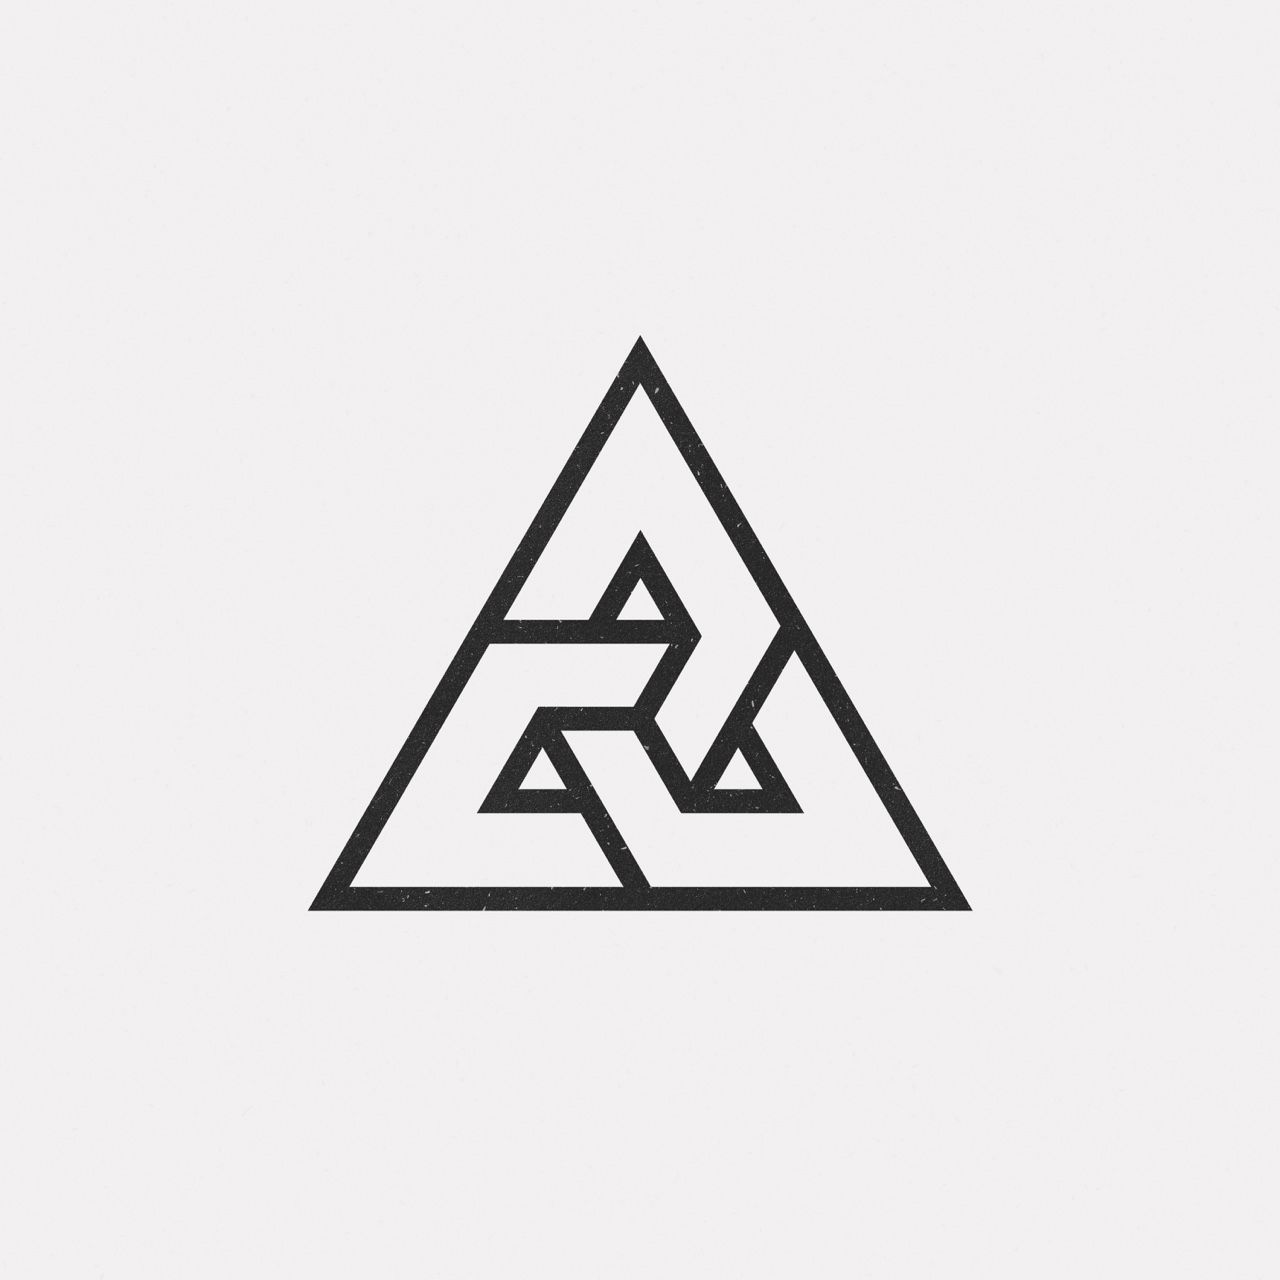 #JU16-616 A new geometric design every day … | Symbols ...